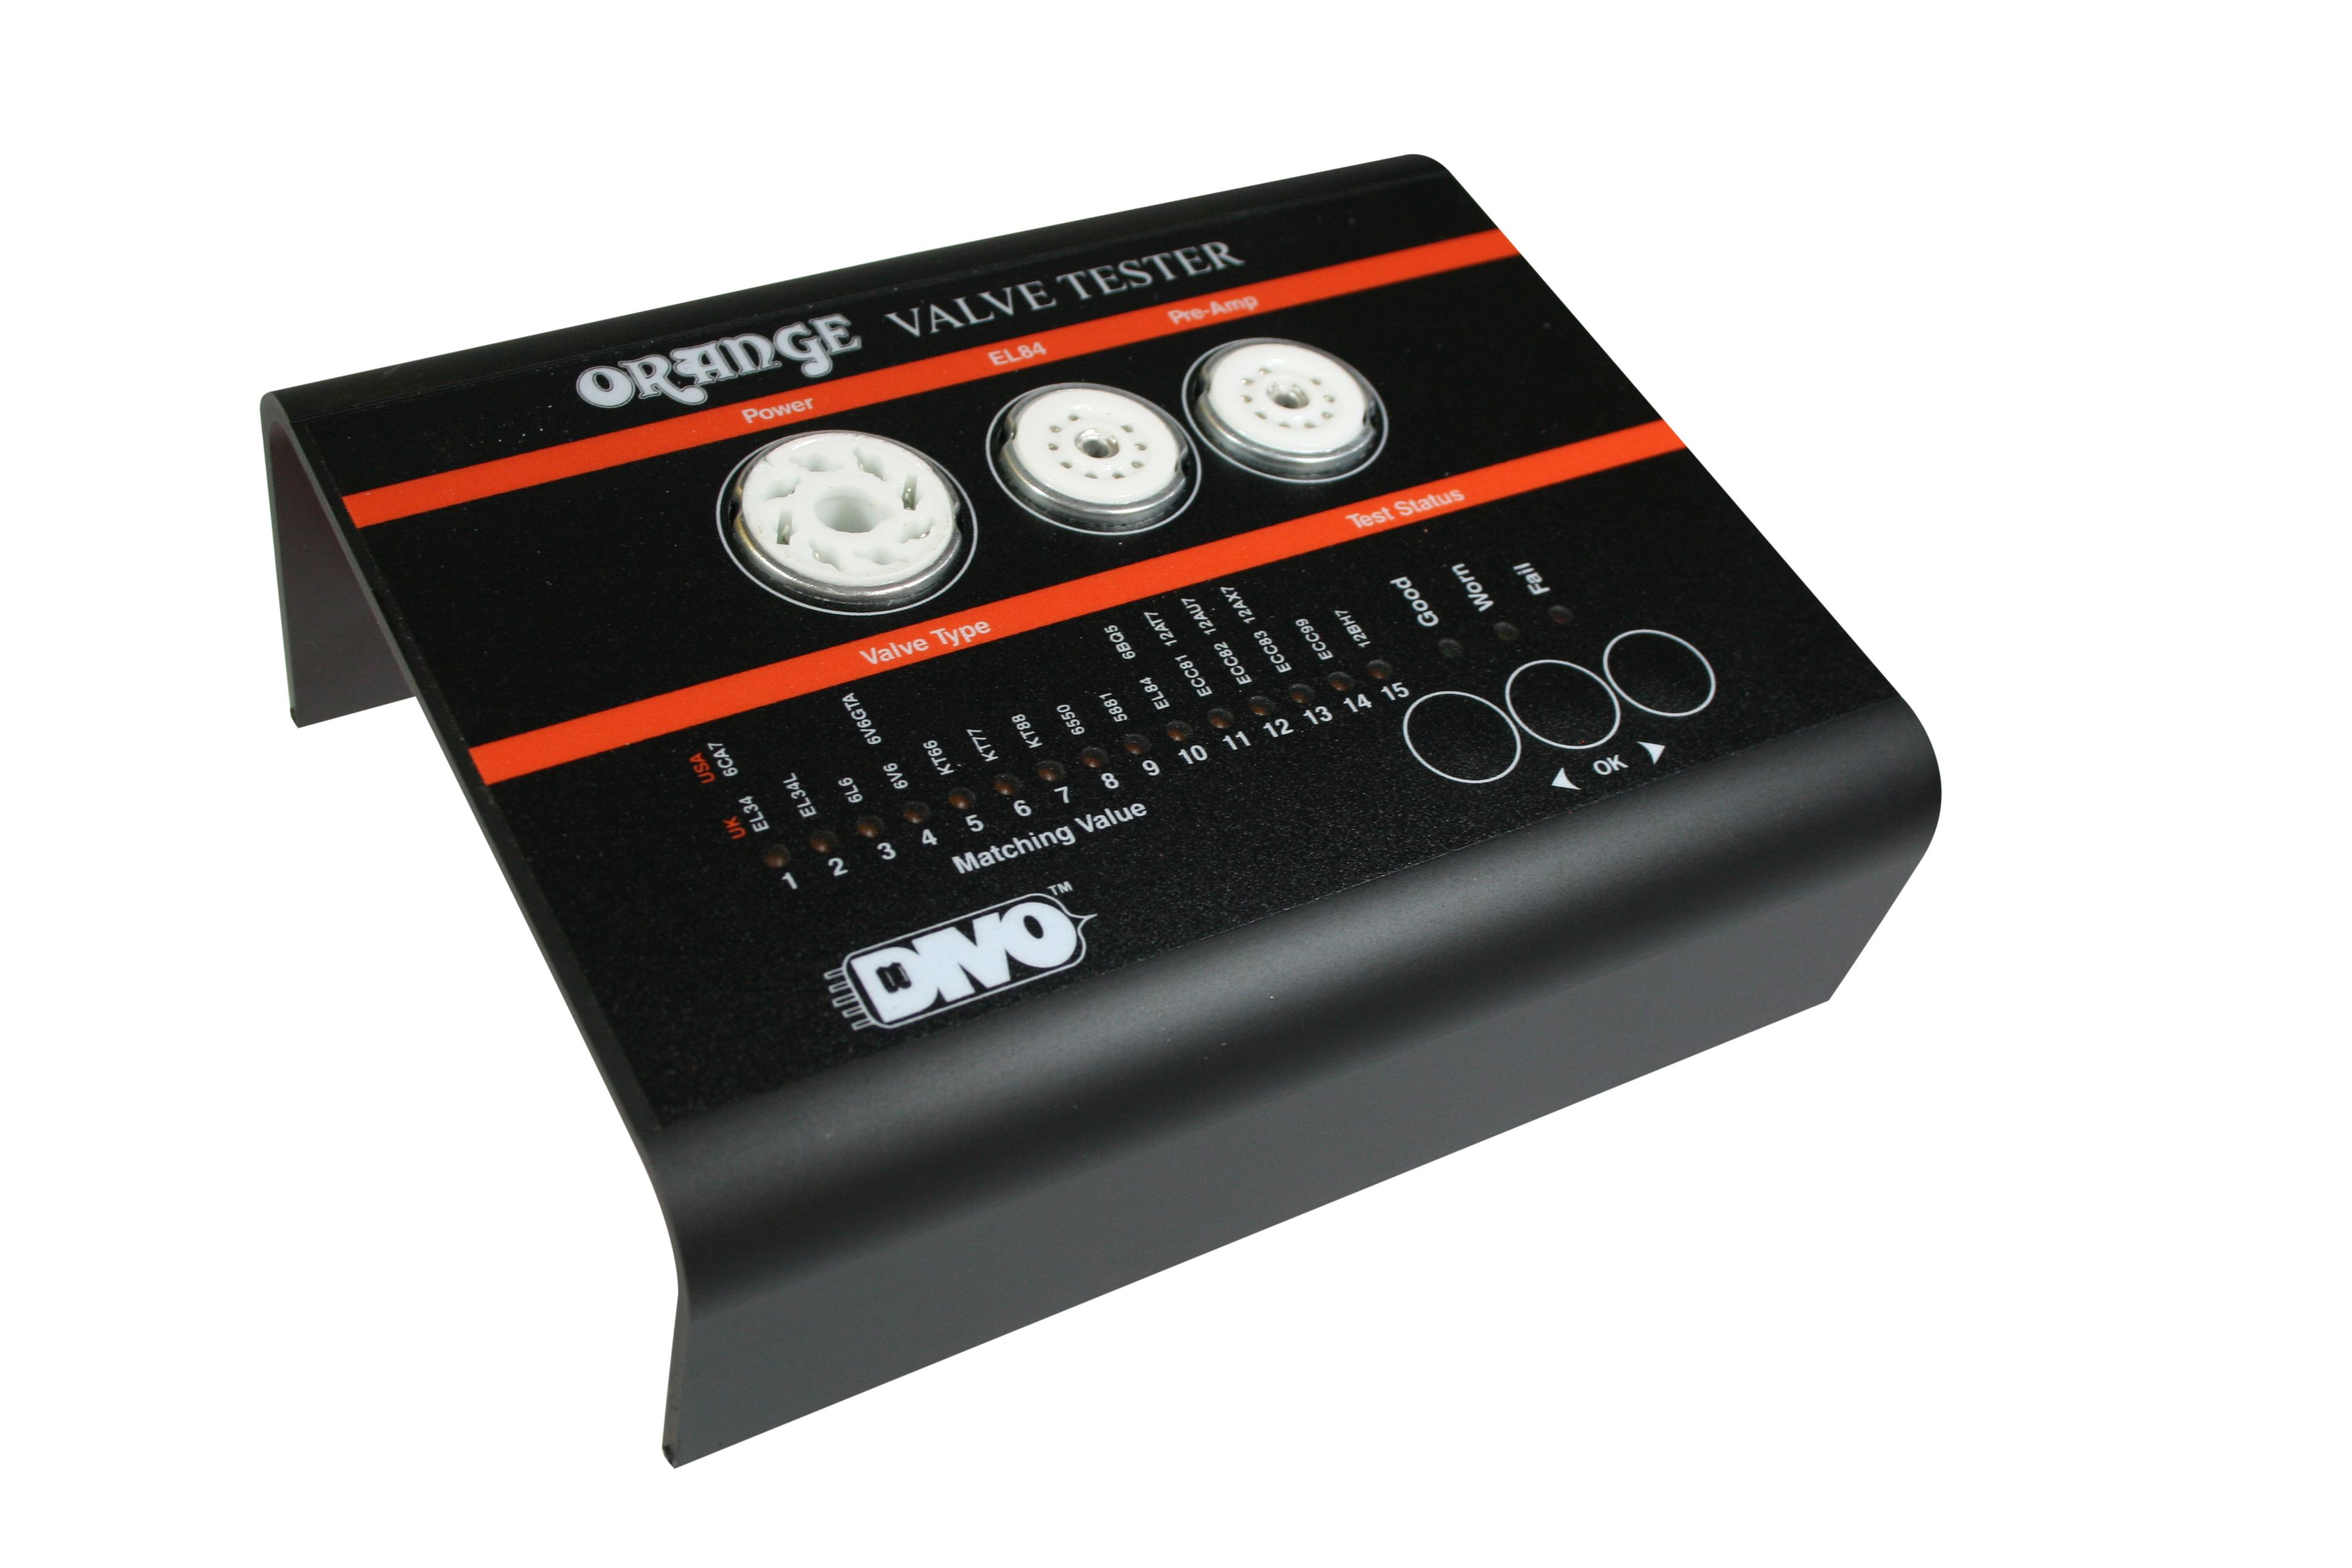 Orange Tube Tester Vt 1000 Bias Tools Measurement And Buy Wholesale Short Circuit Detector From China Banzai Music